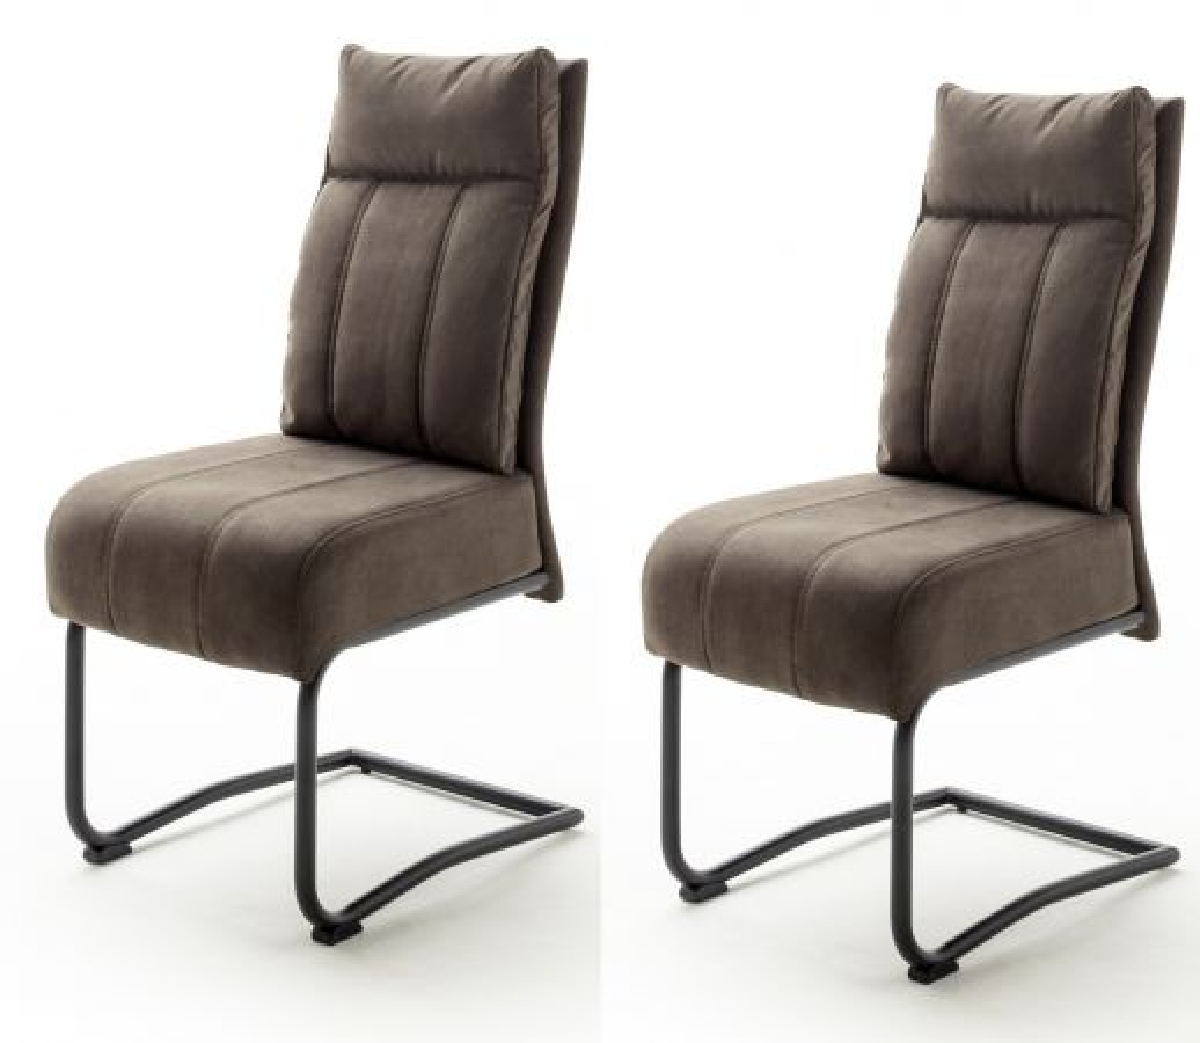 2 x Stuhl Azul sand Antik Freischwinger